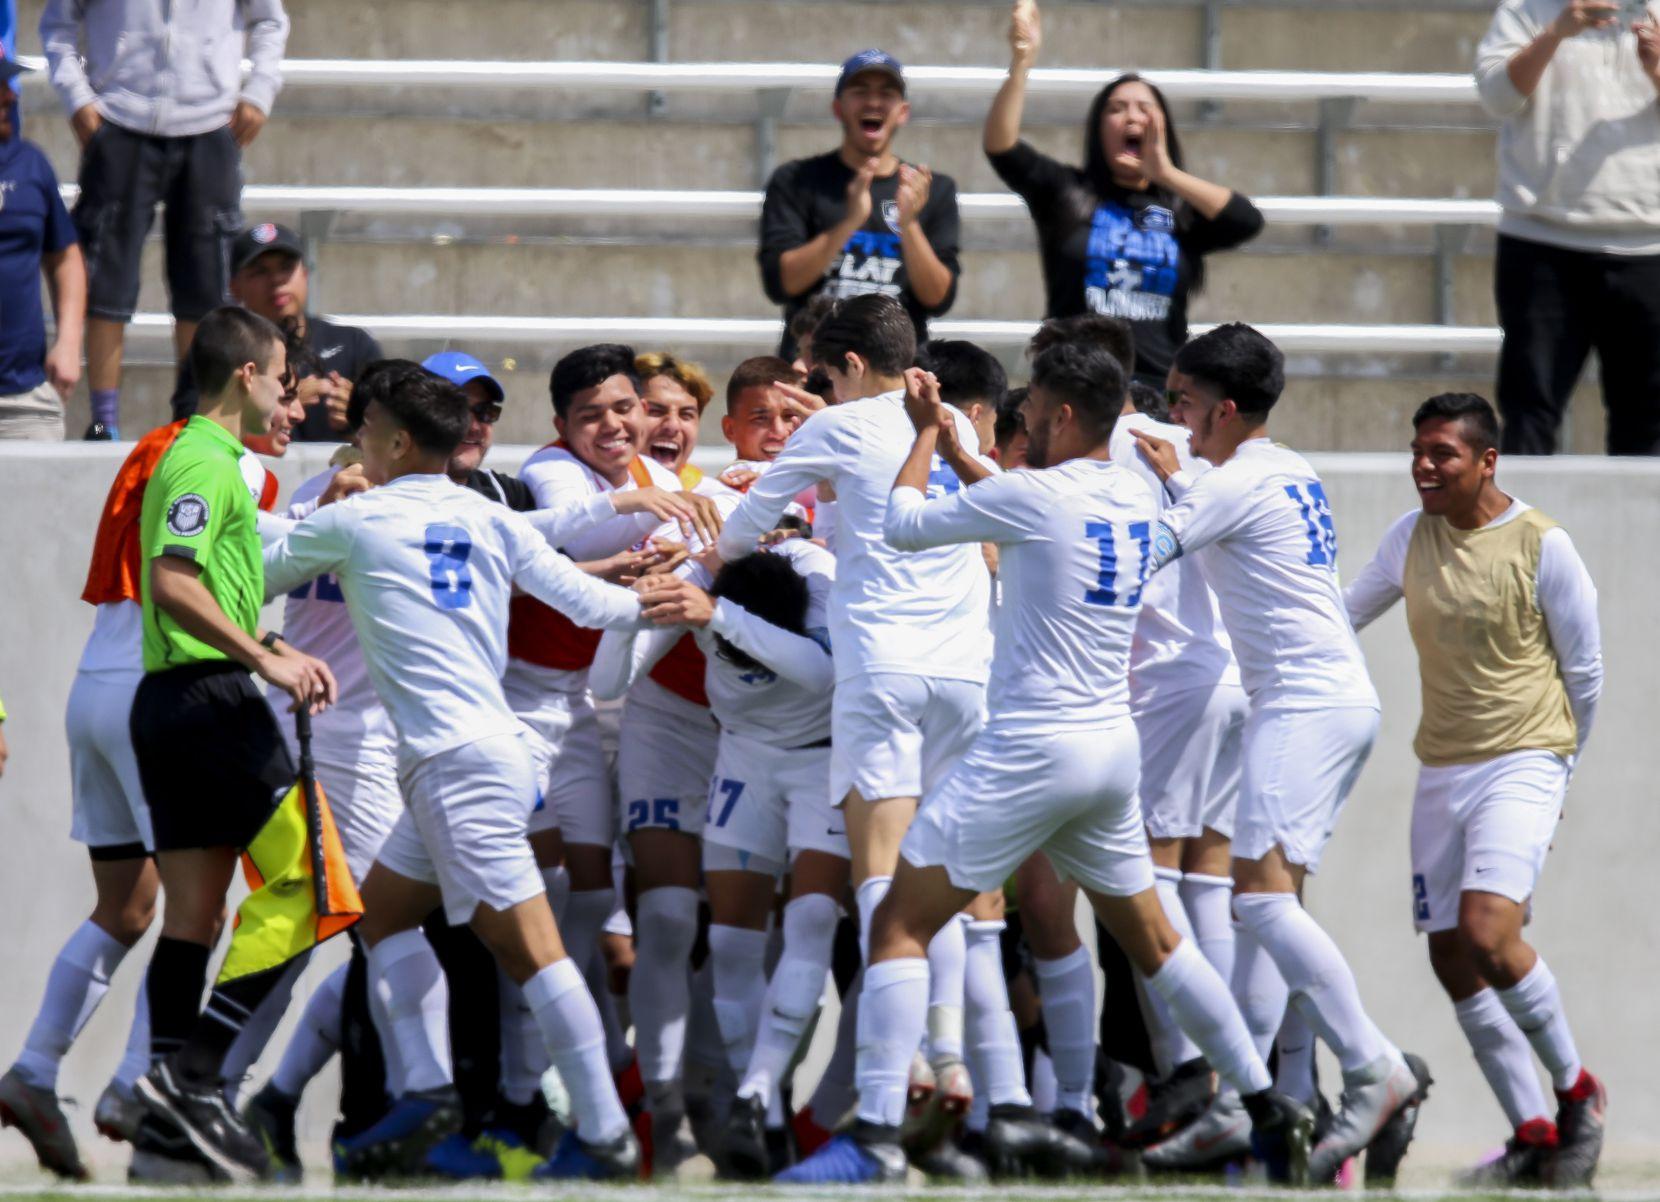 Grand Prairie celebrates a Baltazar Jimenez goal during a Class 6A Region I semifinal soccer game at McKinney ISD Stadium in McKinney, Texas on Friday, April 12, 2019. (Shaban Athuman/Staff Photographer)